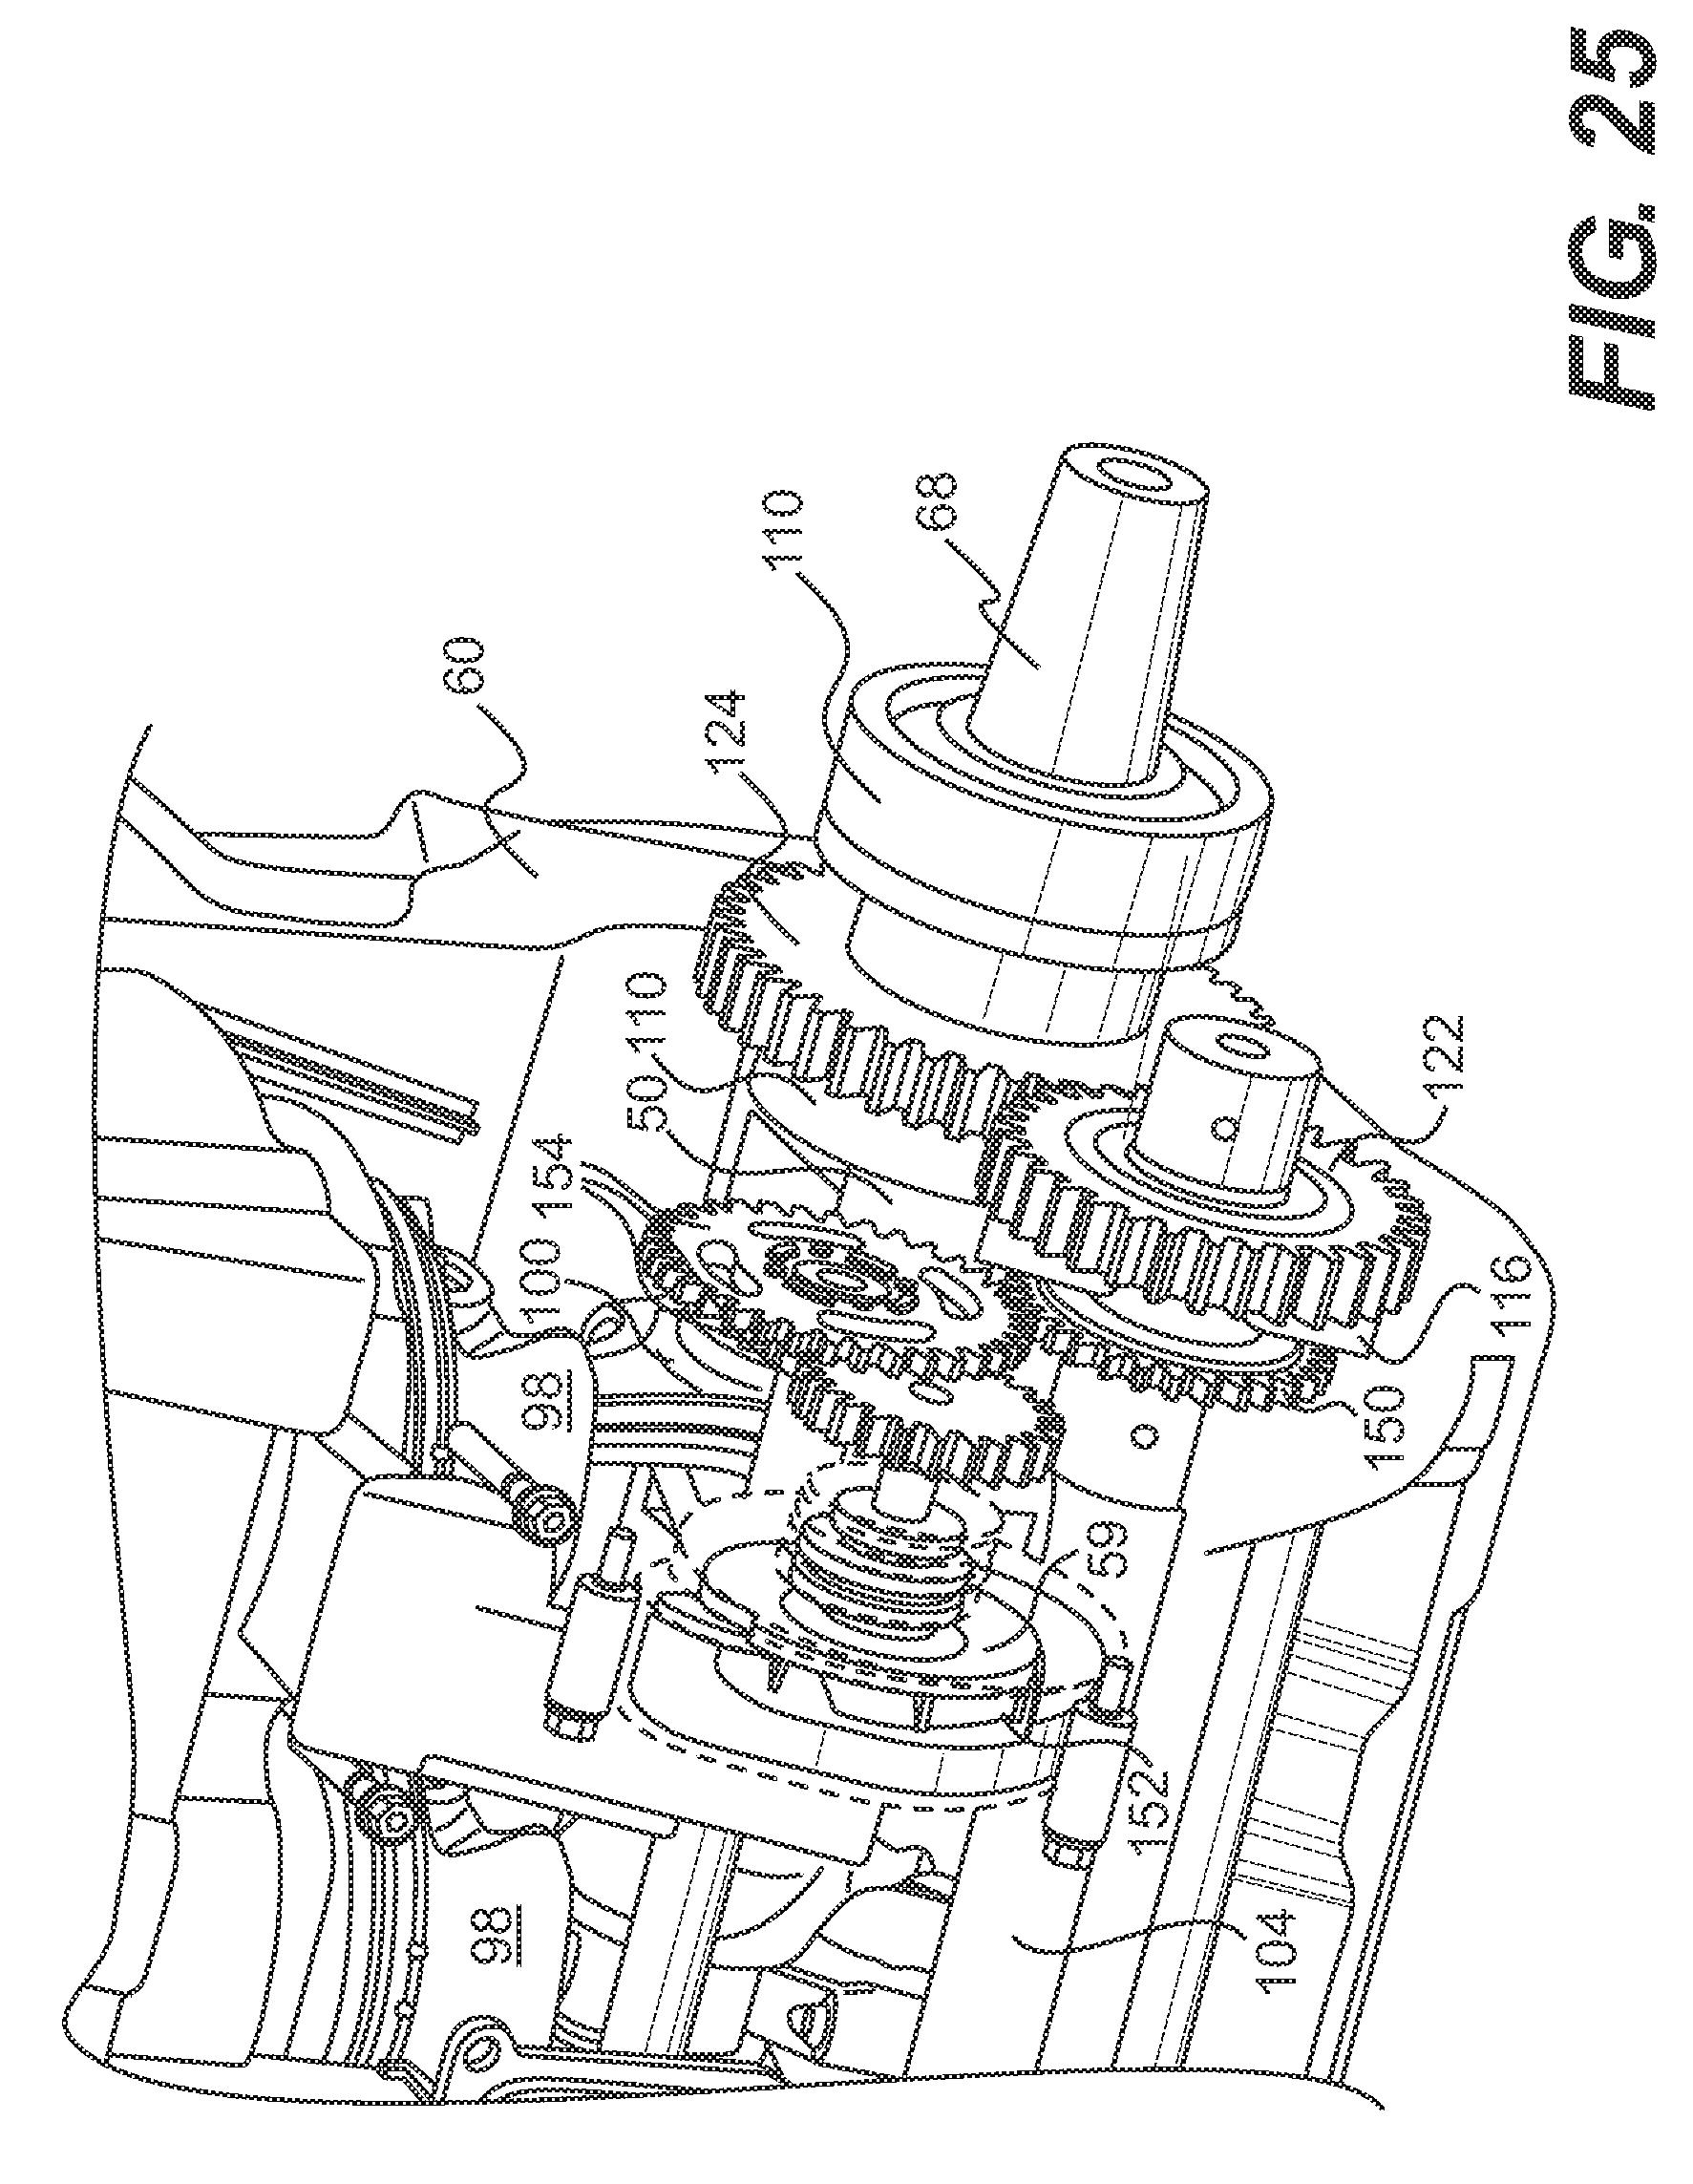 Engine Cam Follower Diagram Wire Diagram For 2000 Damon 04